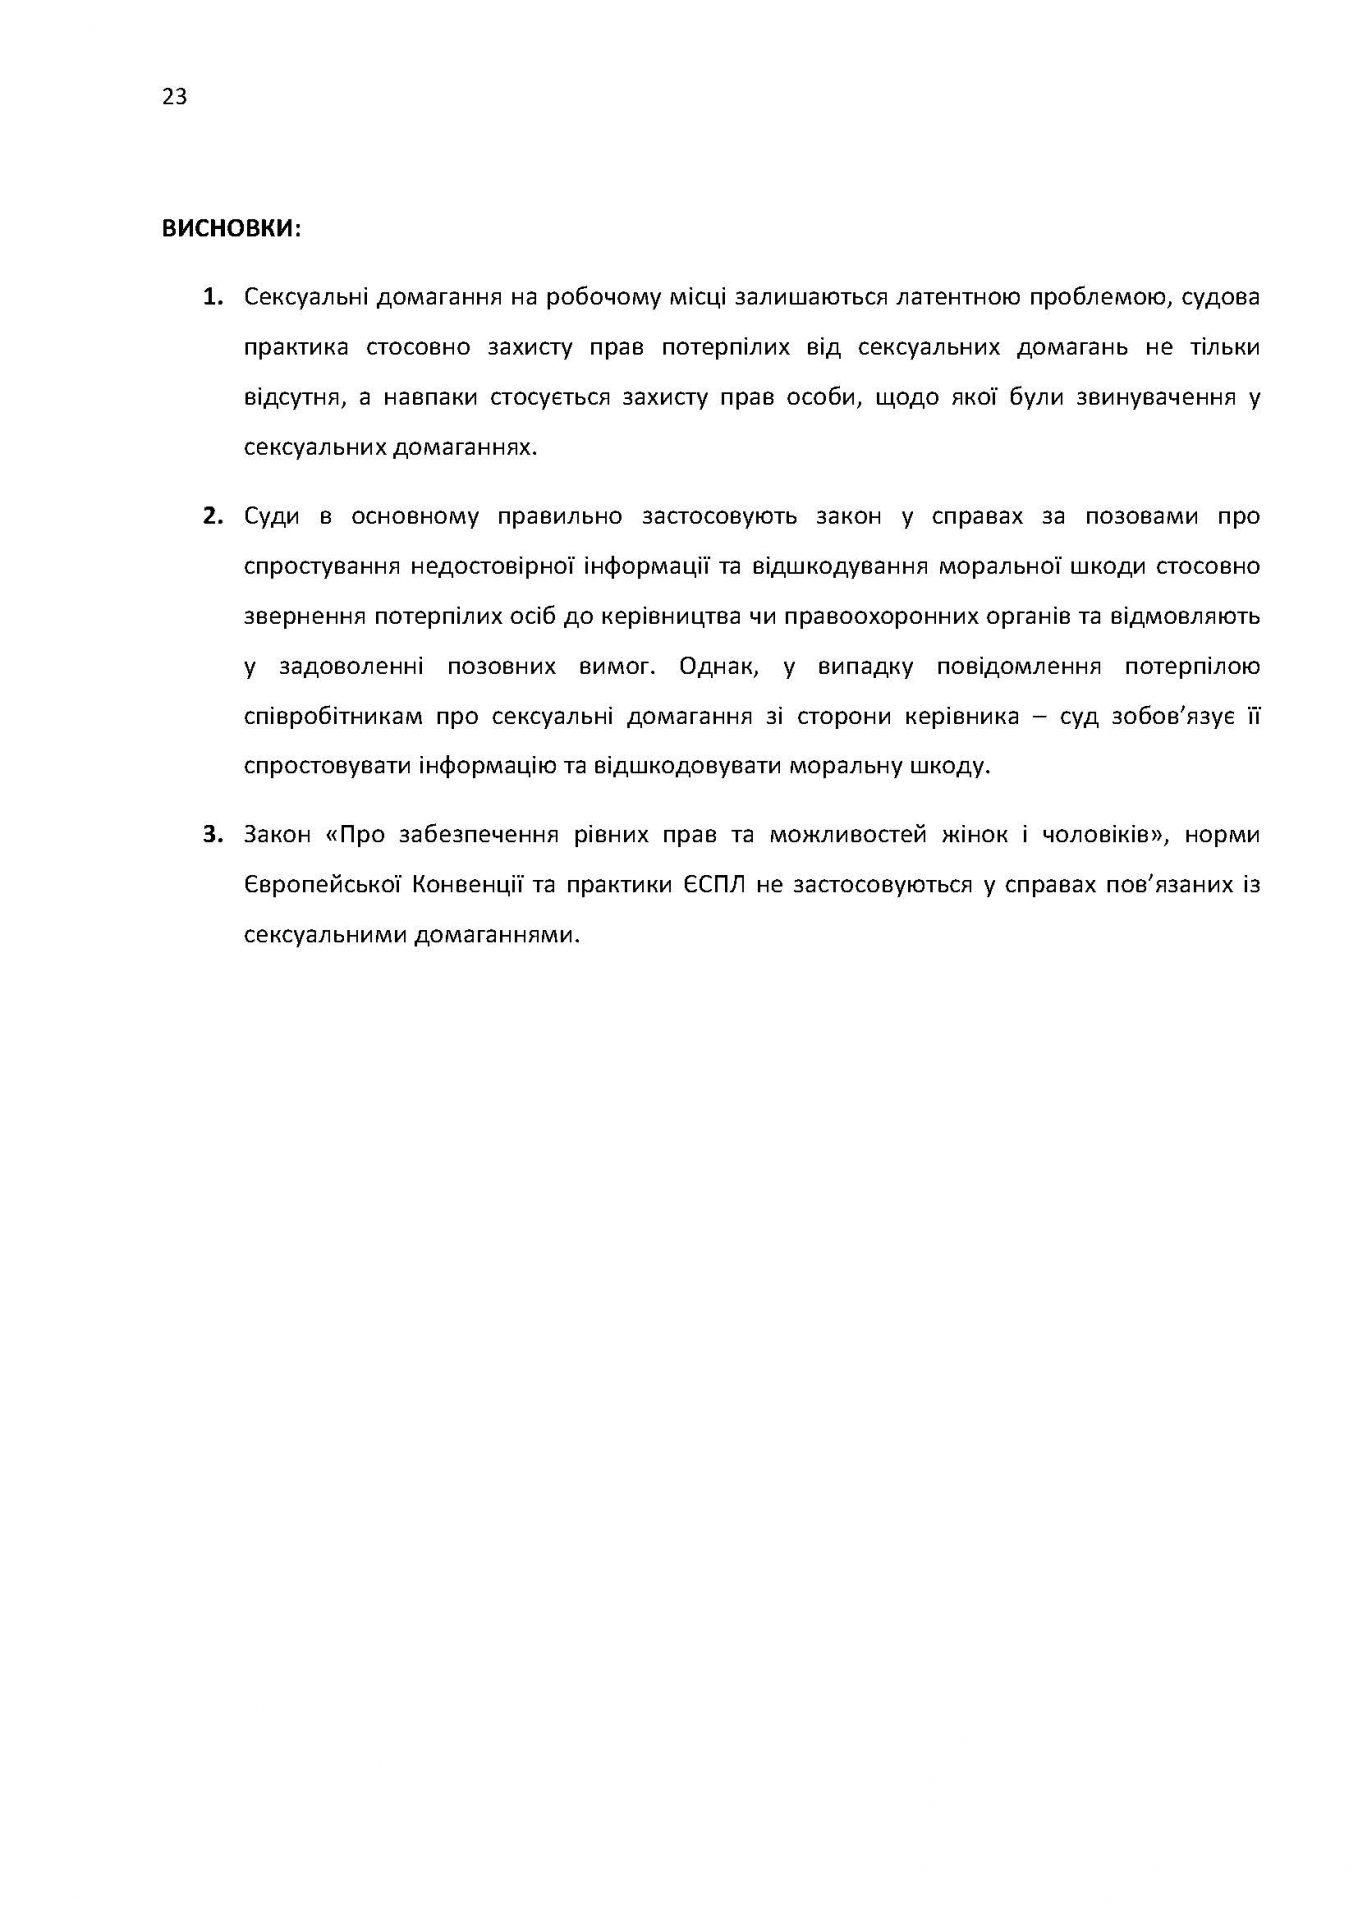 Draft Report monitoring print USAID_Страница_23